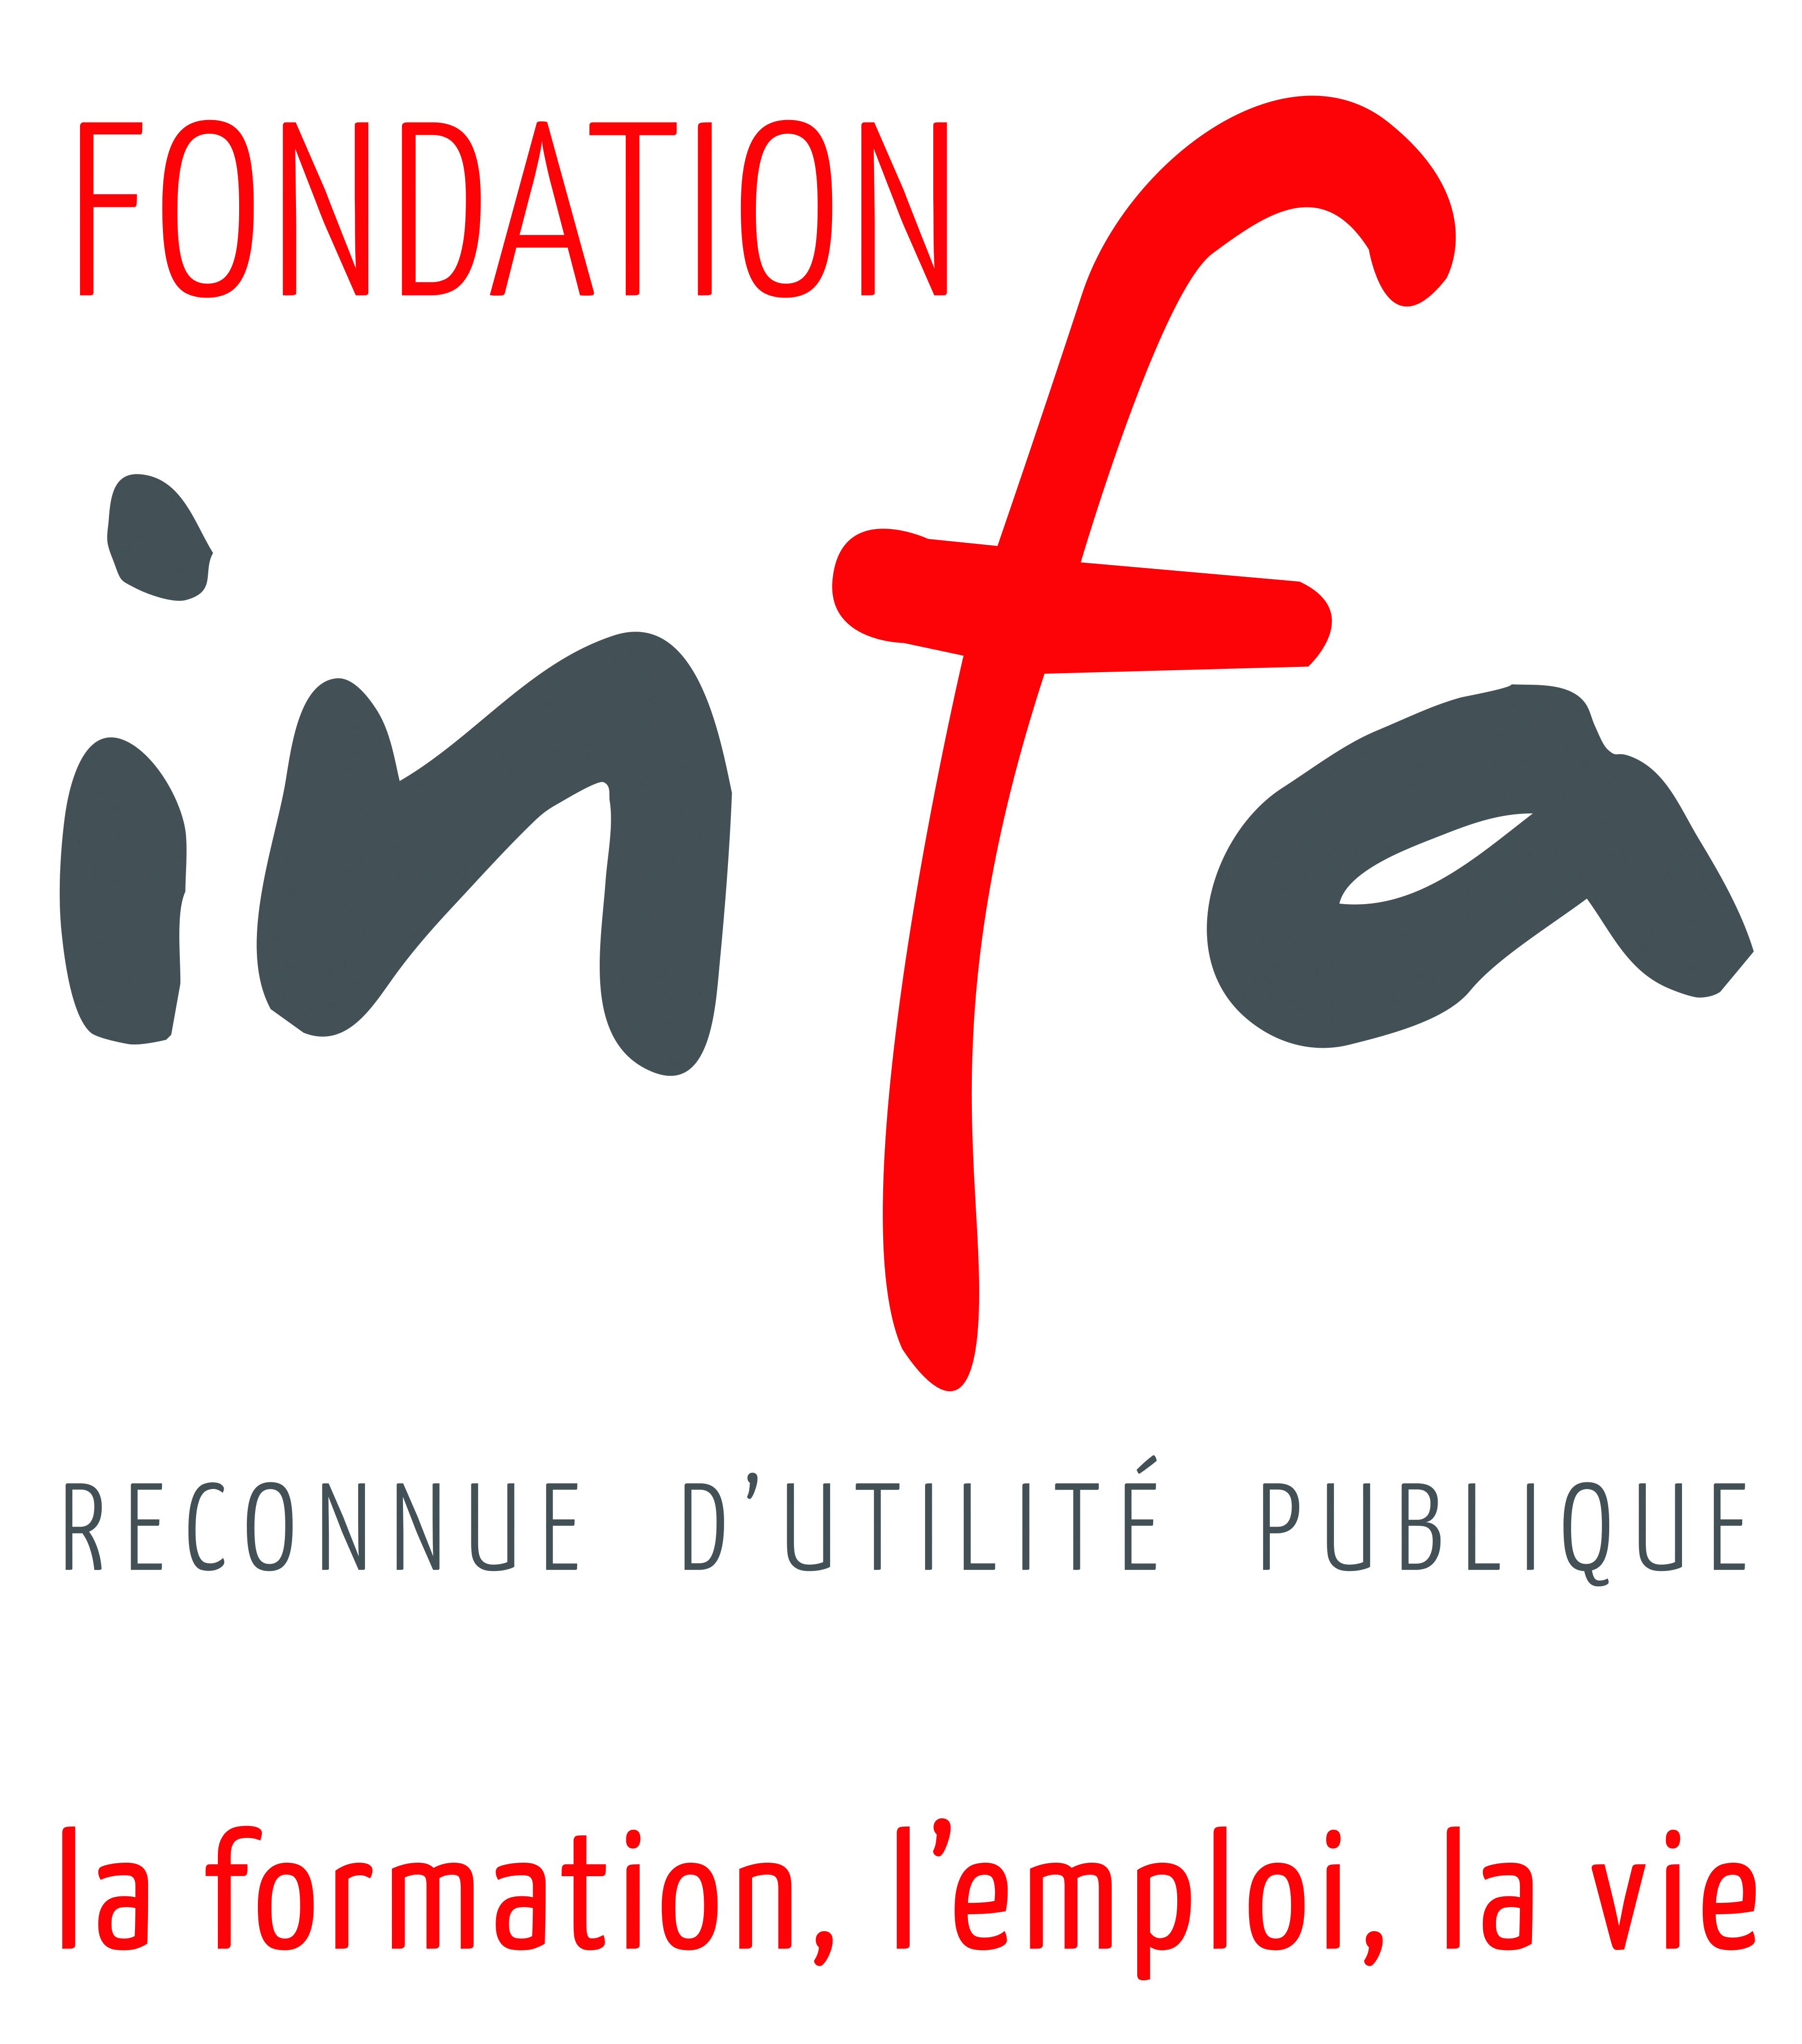 Association - Fondation INFA